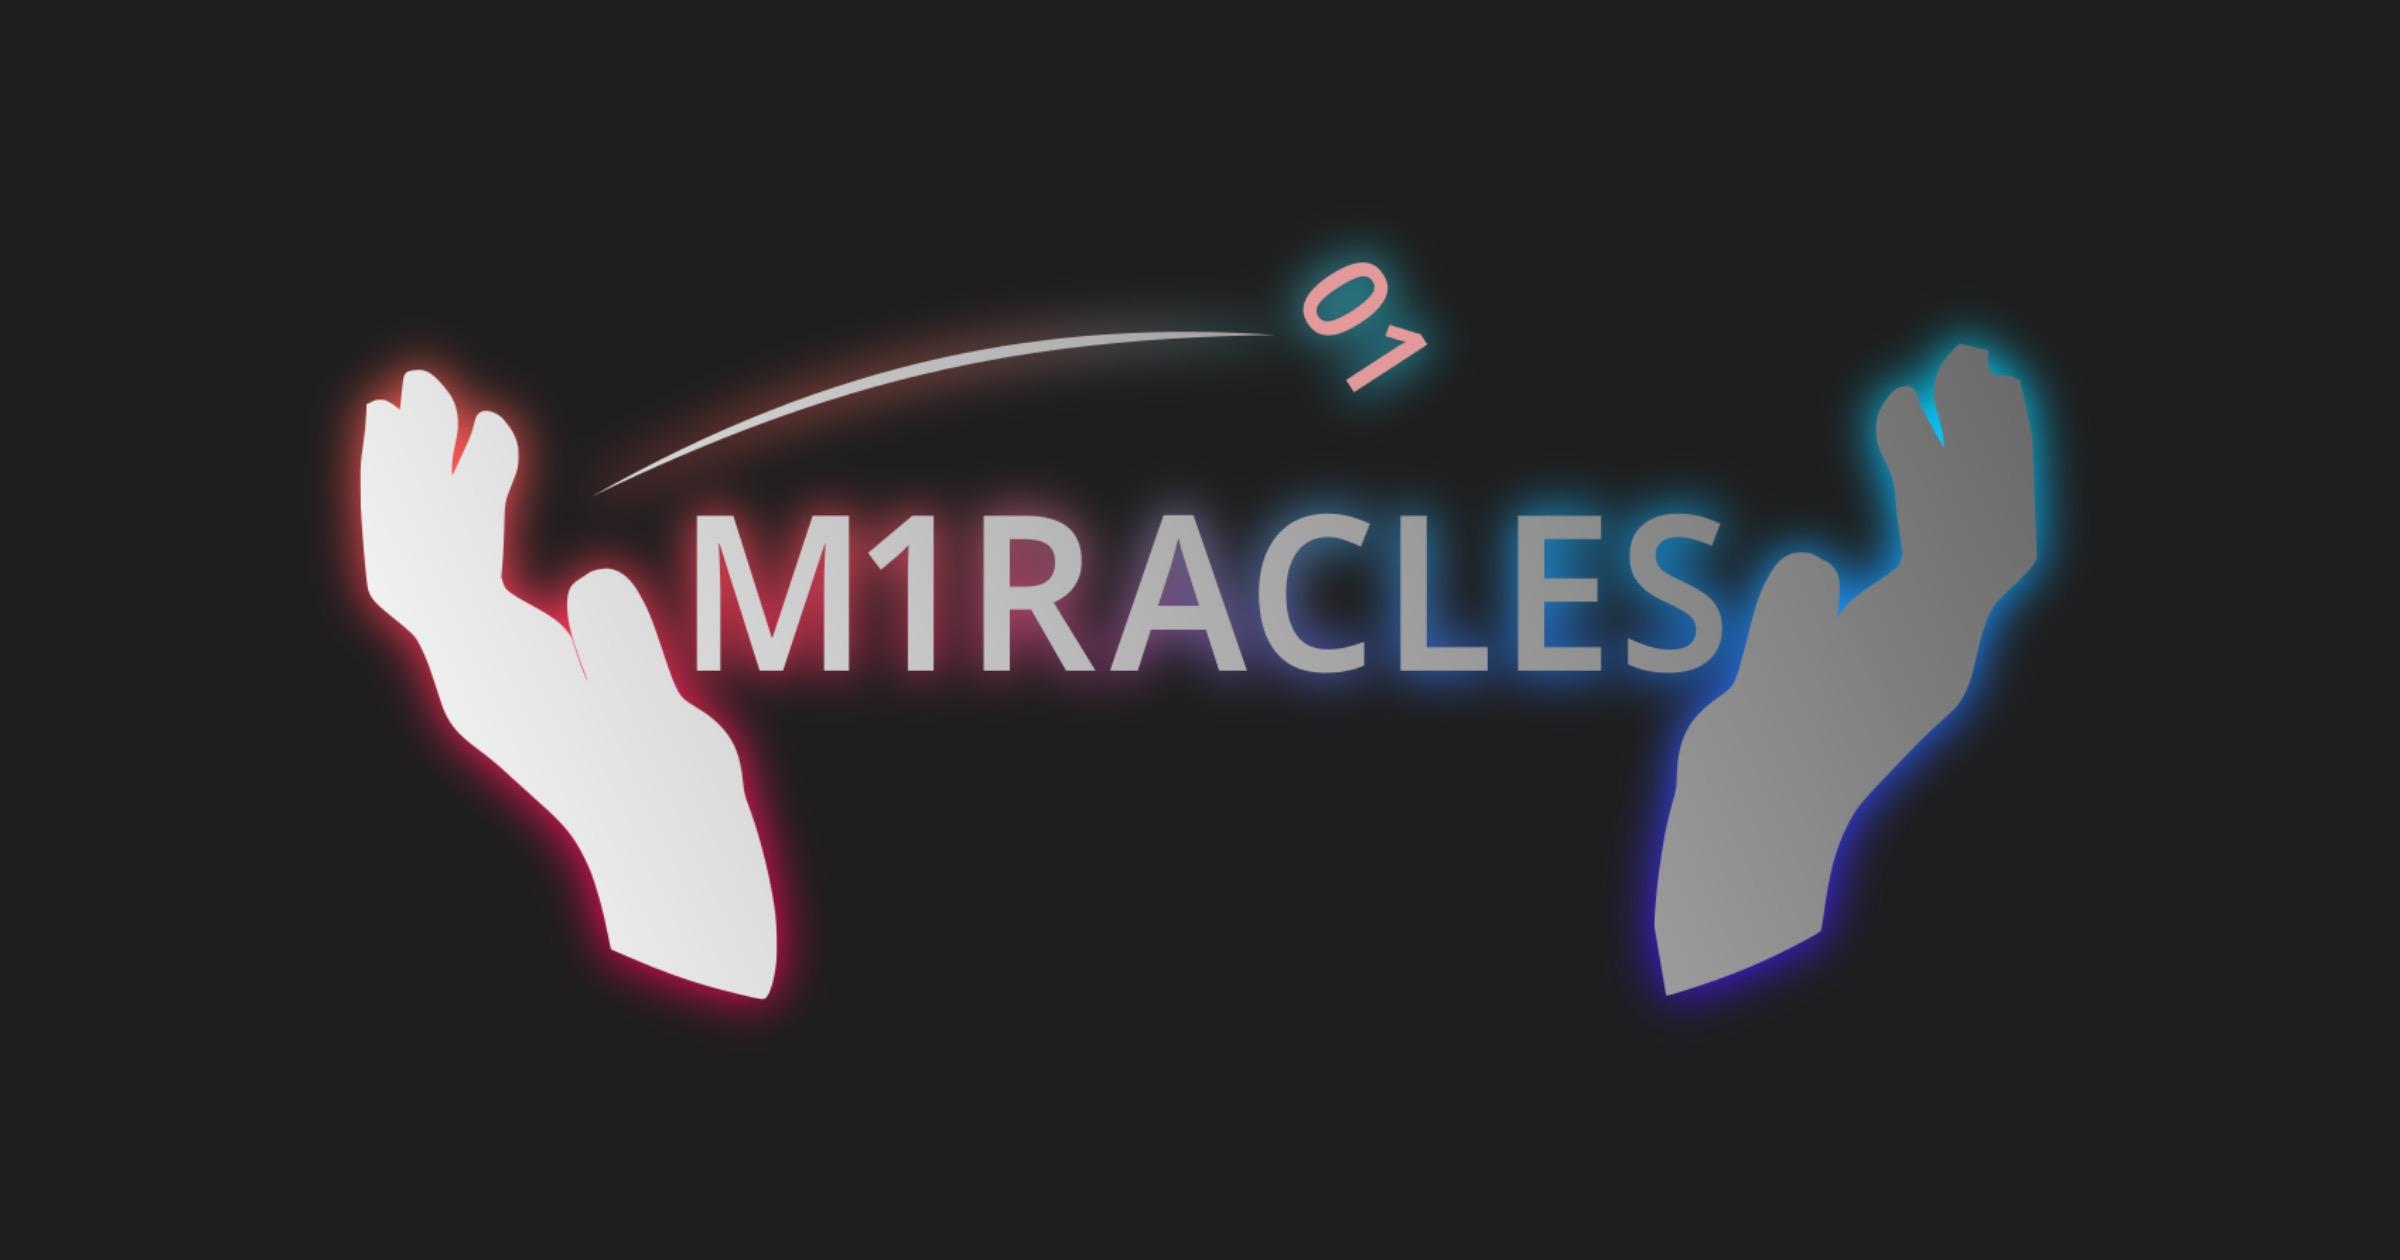 M1racles mac flaw